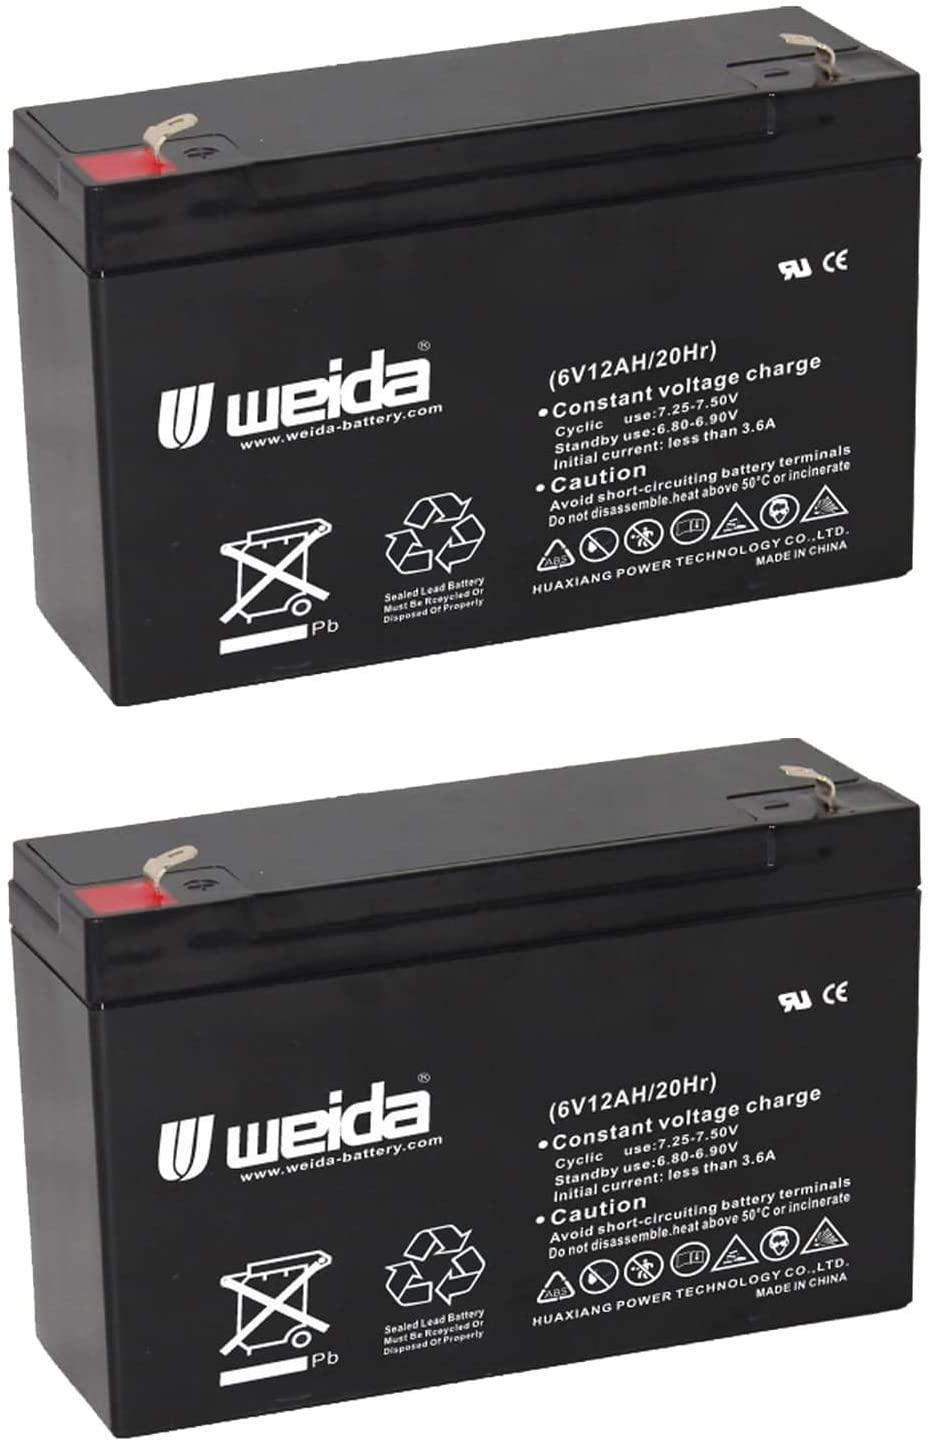 6V 12Ah SLA Battery Rechargeable SLA Replace UB6120, D5778, PS6100 Fast USA Ship